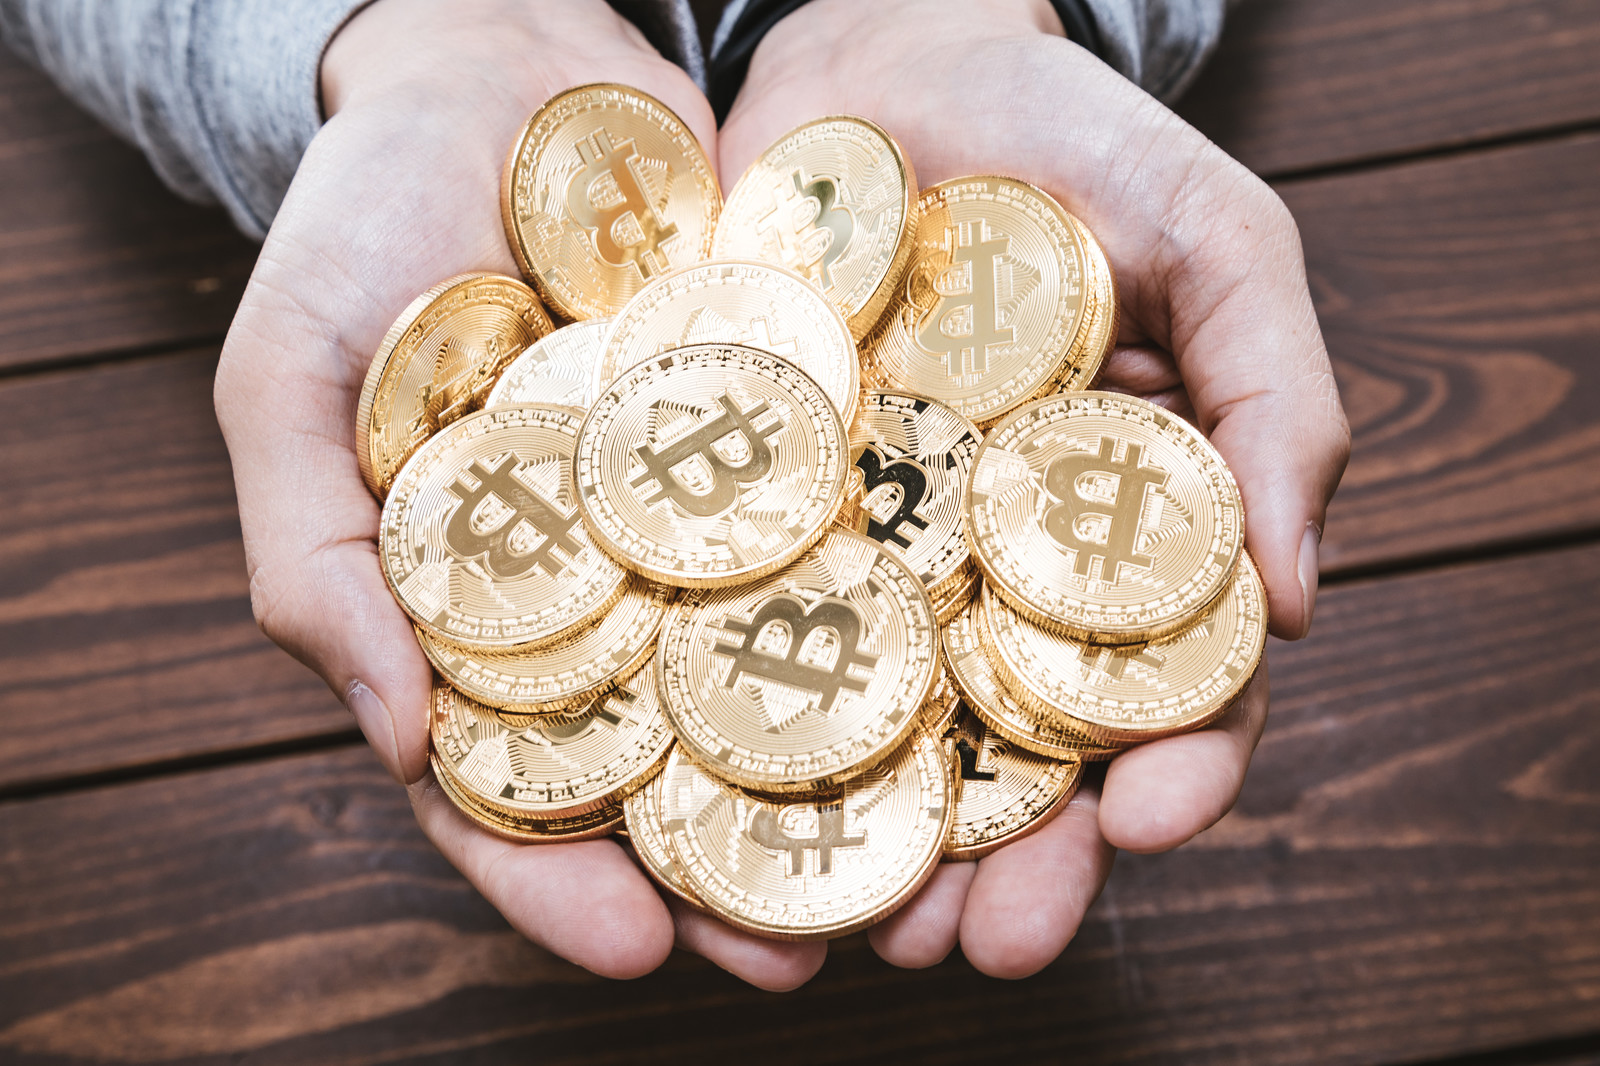 Holding-Bitcoin-Bank-Pakutaso.jpg